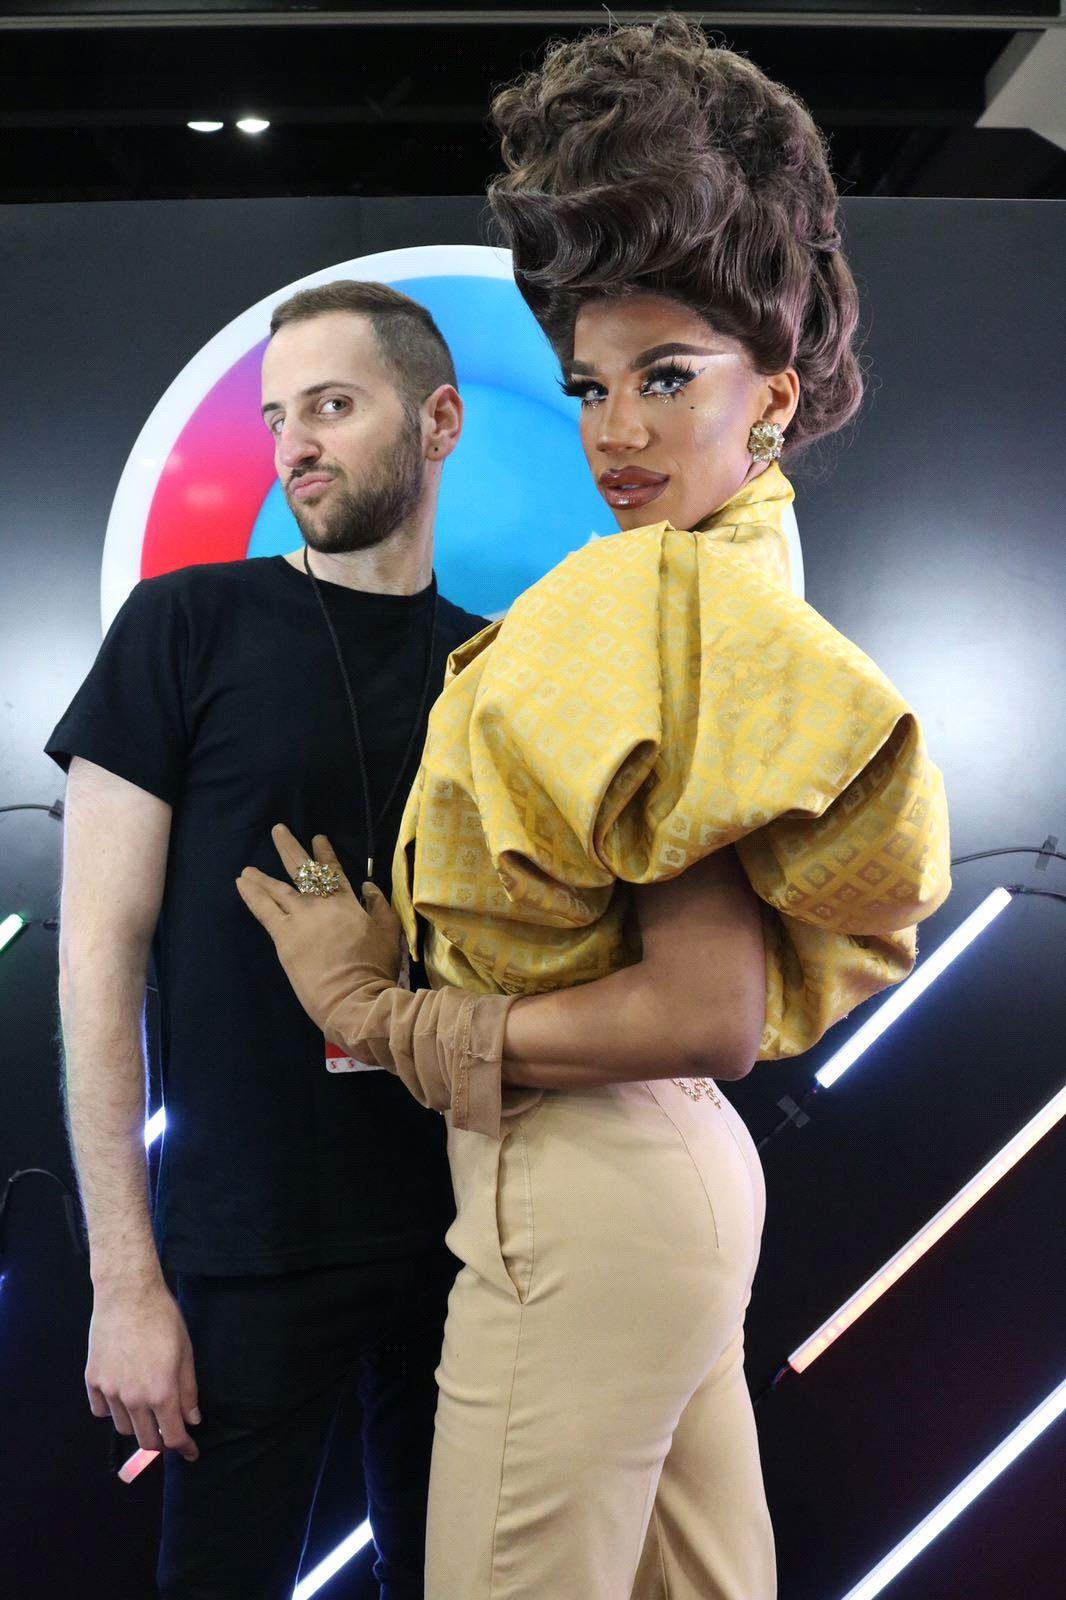 Facetune Product Manager Daniel Berkovitz with Naomi Smalls at RuPaul's DragCon LA 2018 (Courtesy Lightricks)